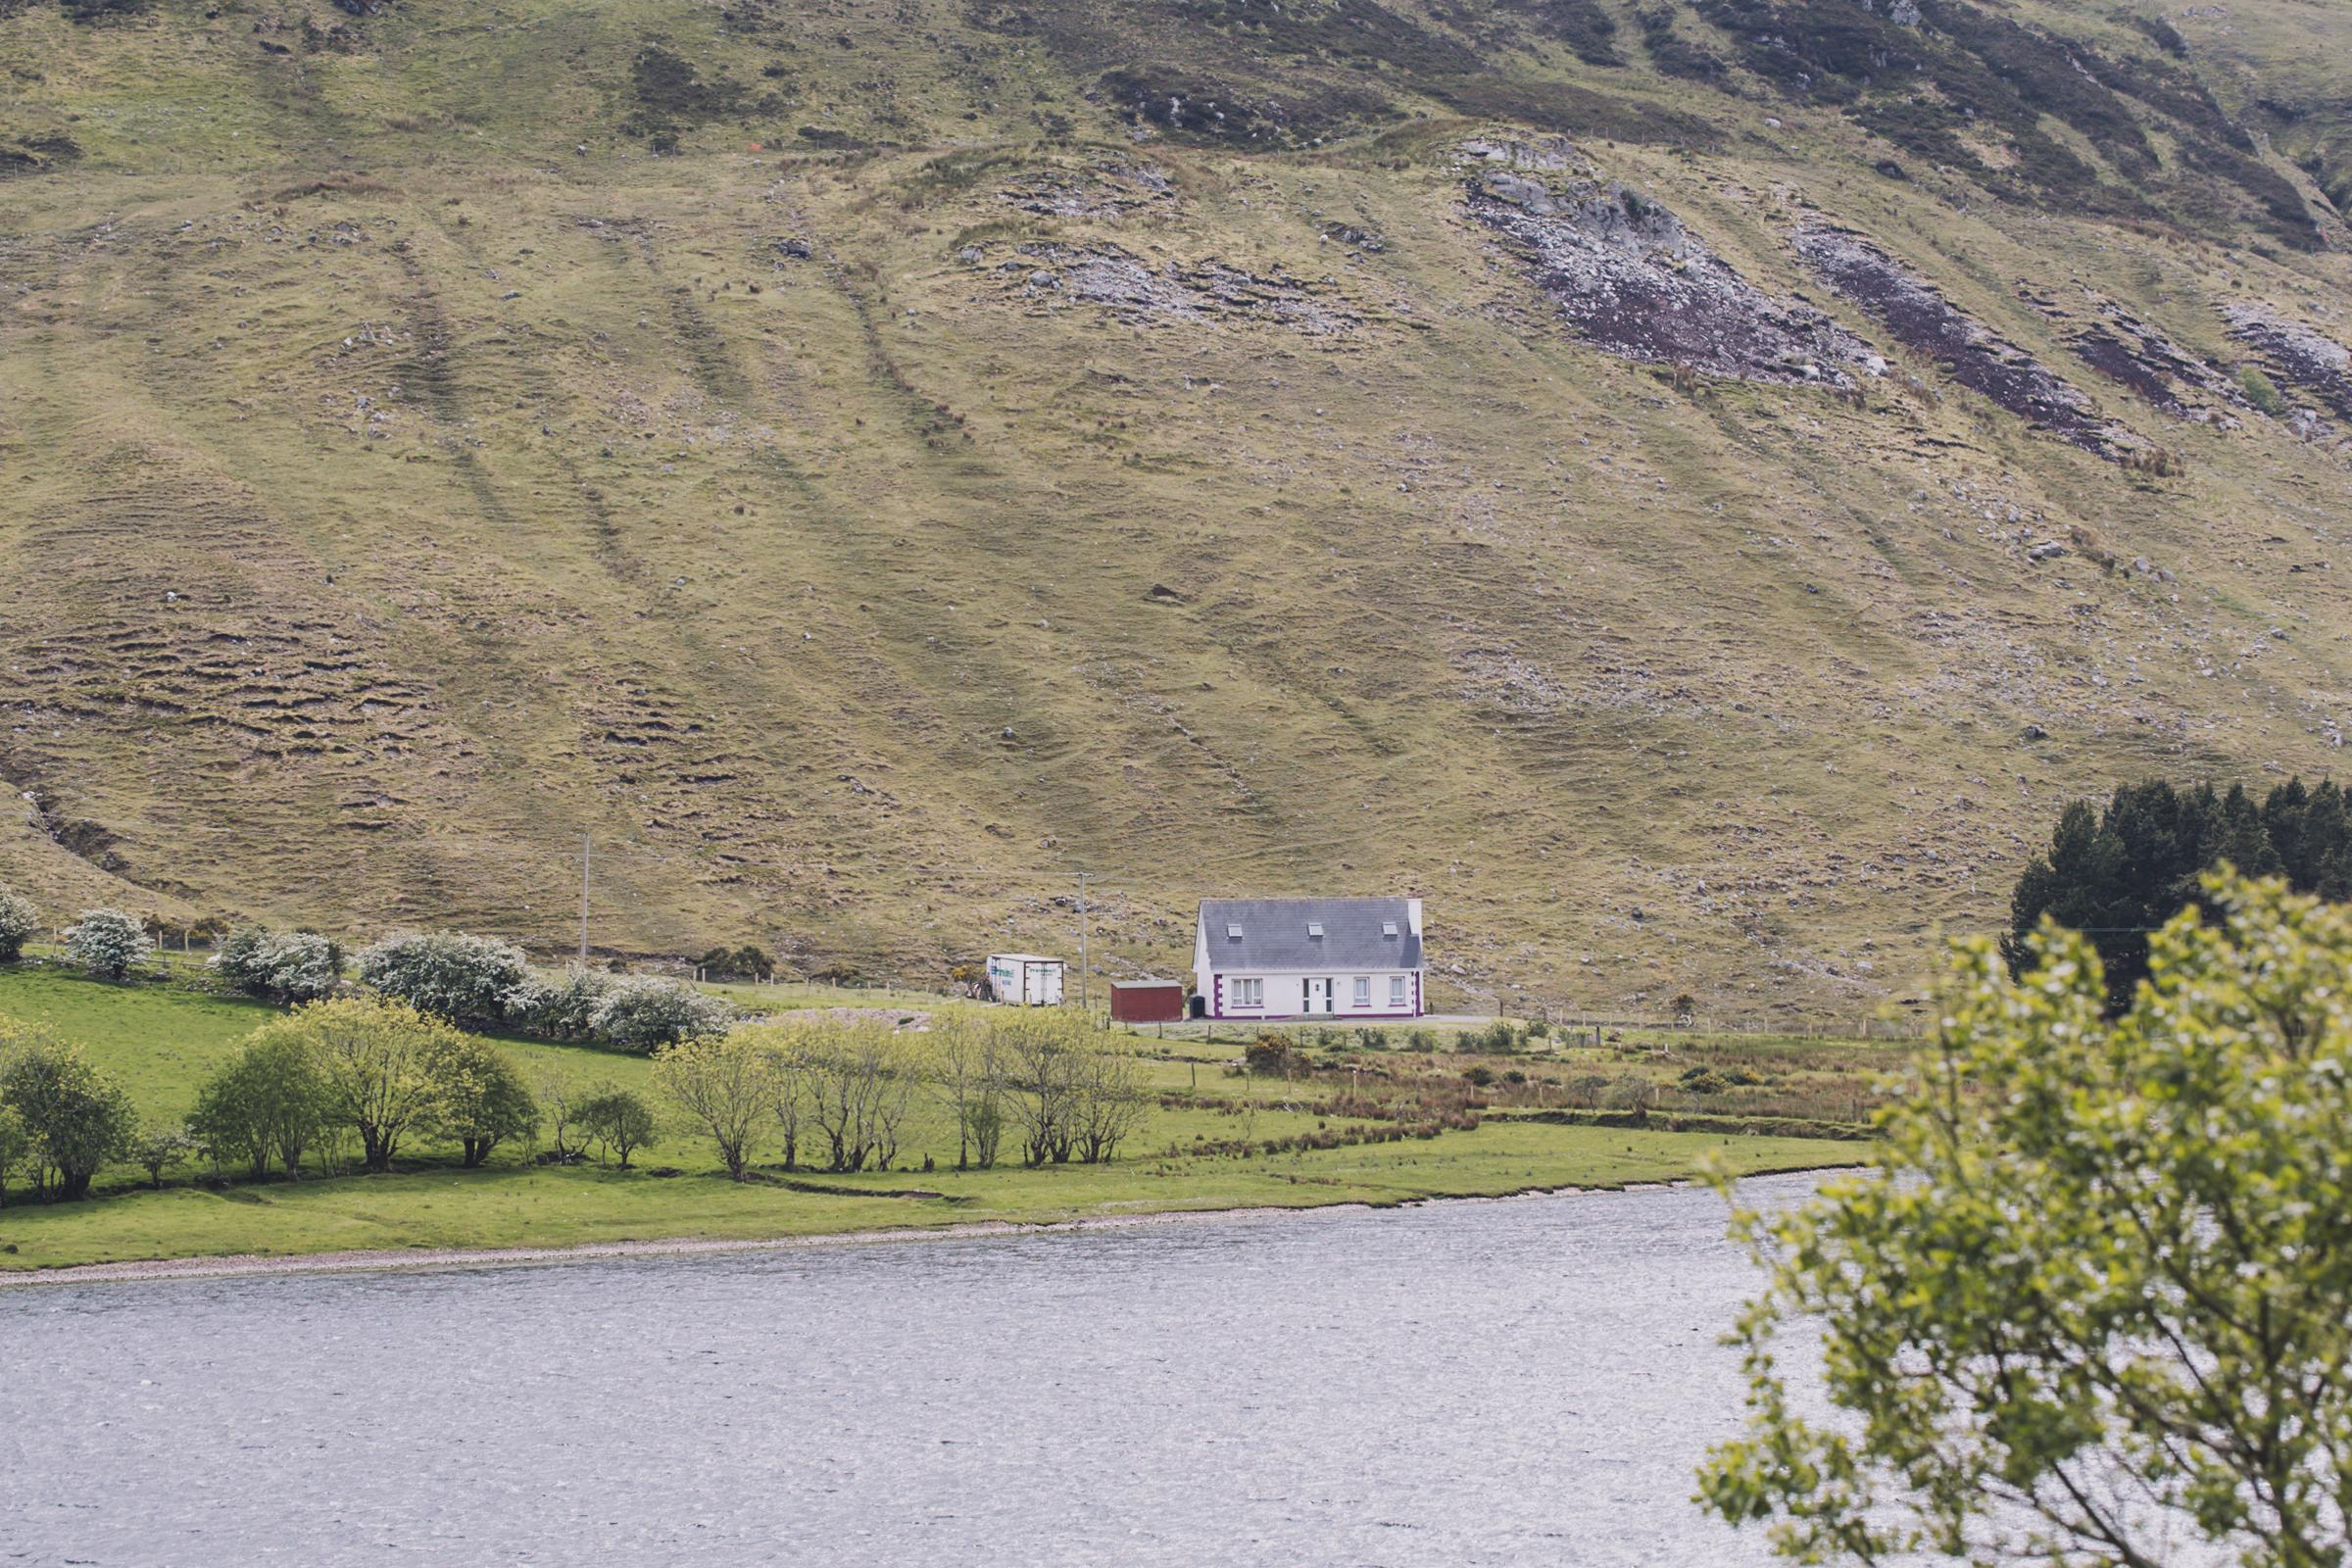 20150616-062-Ireland_Travel_Editorial.jpg